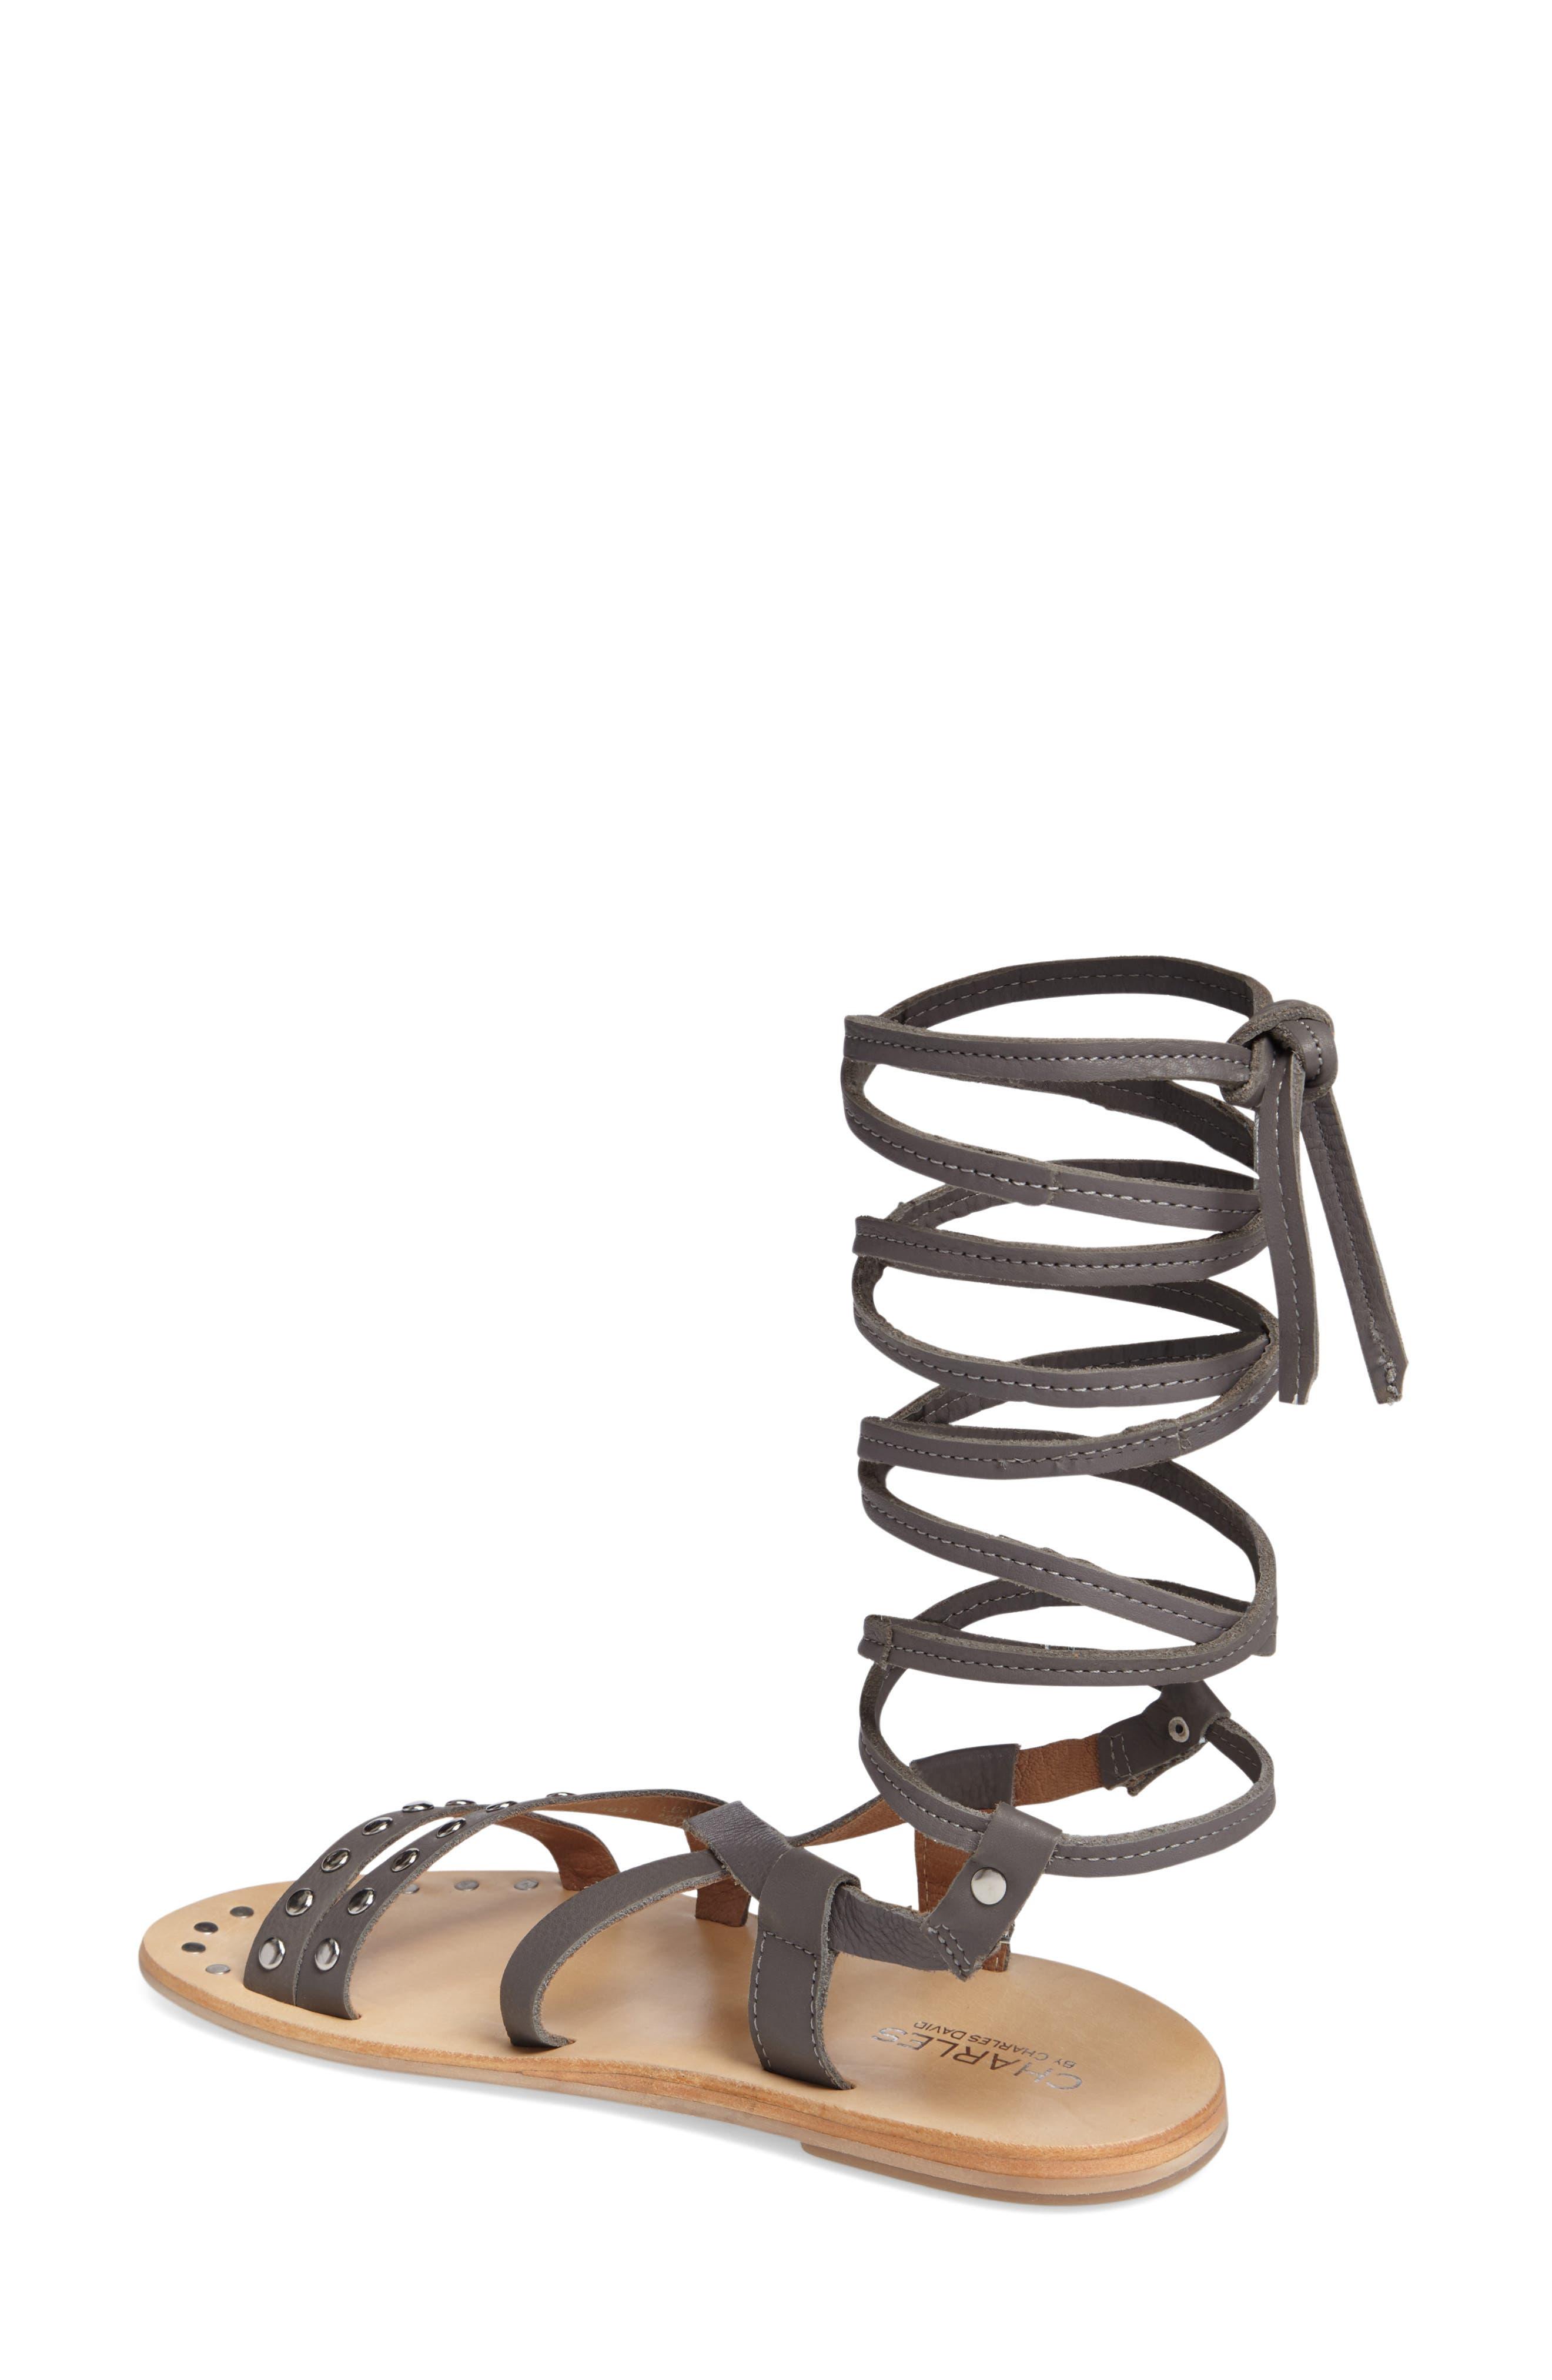 Alternate Image 2  - Charles by Charles David Steeler Ankle Wrap Sandal (Women)